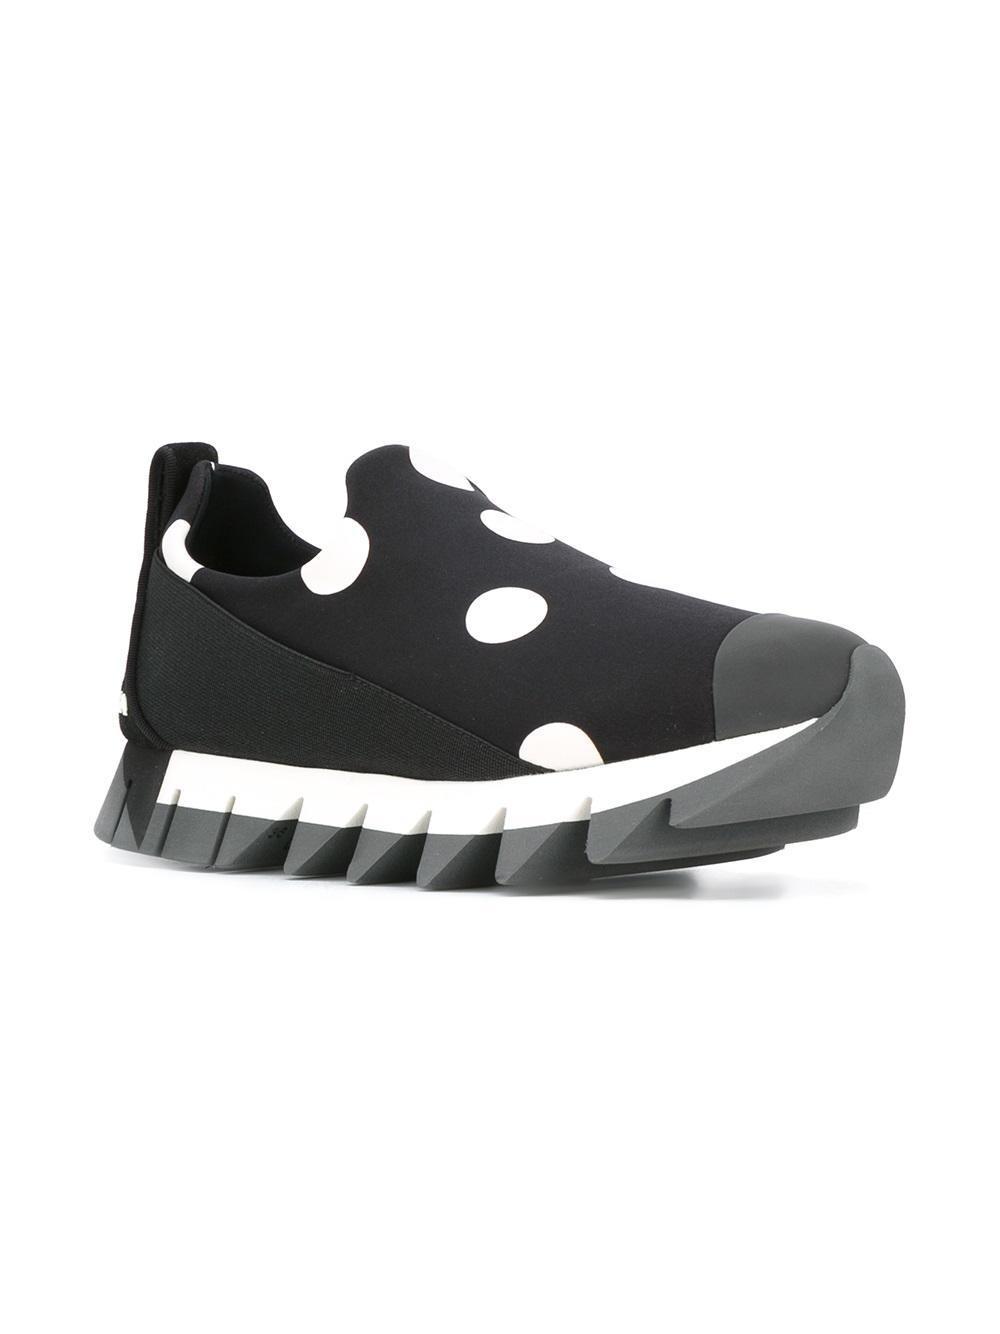 dolce and gabbana ibiza sneakers